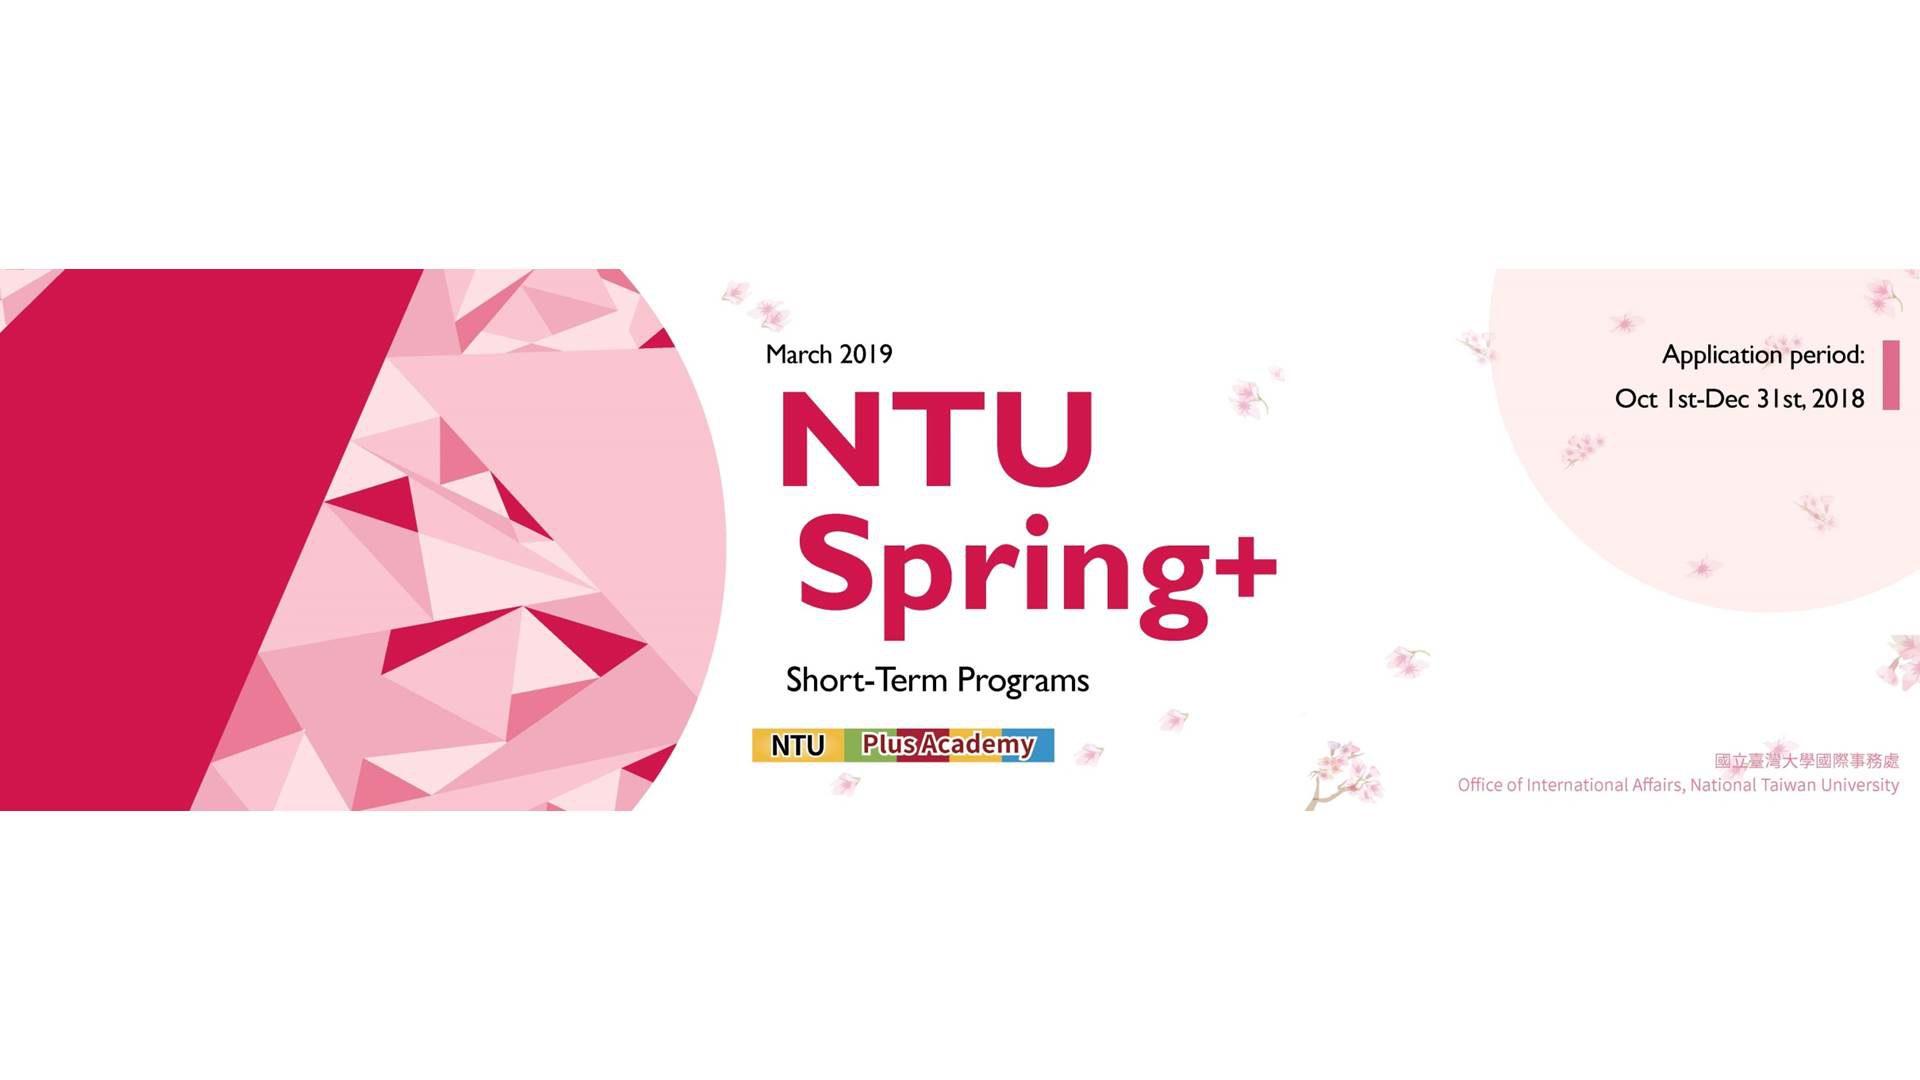 Online Application for 2019 National Taiwan University's Spring Exchange Student Program